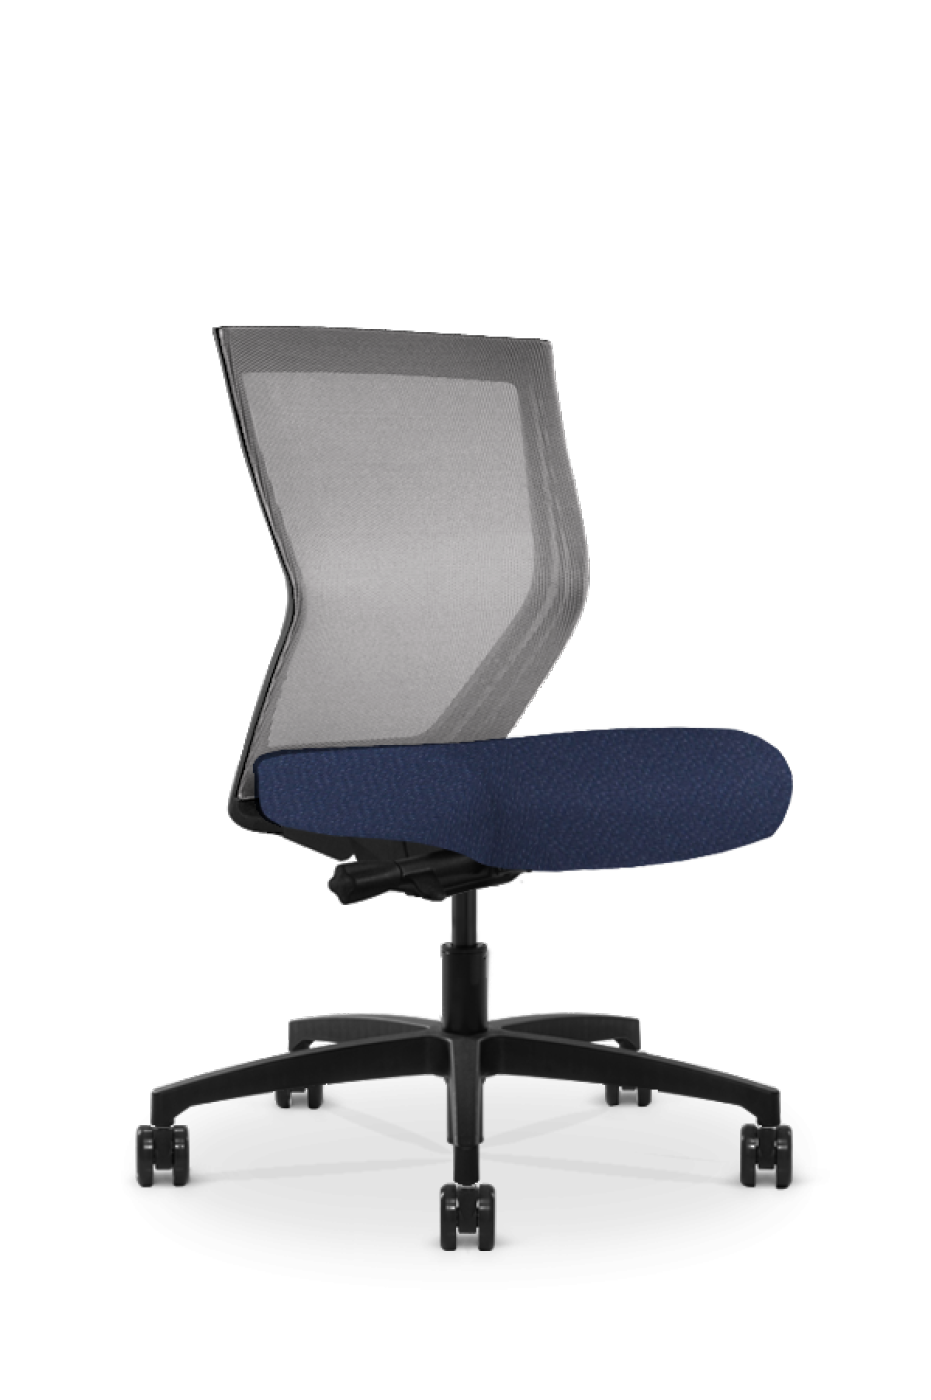 Run II High Back Black Frame Office Chair with Orange Grey Mesh Back